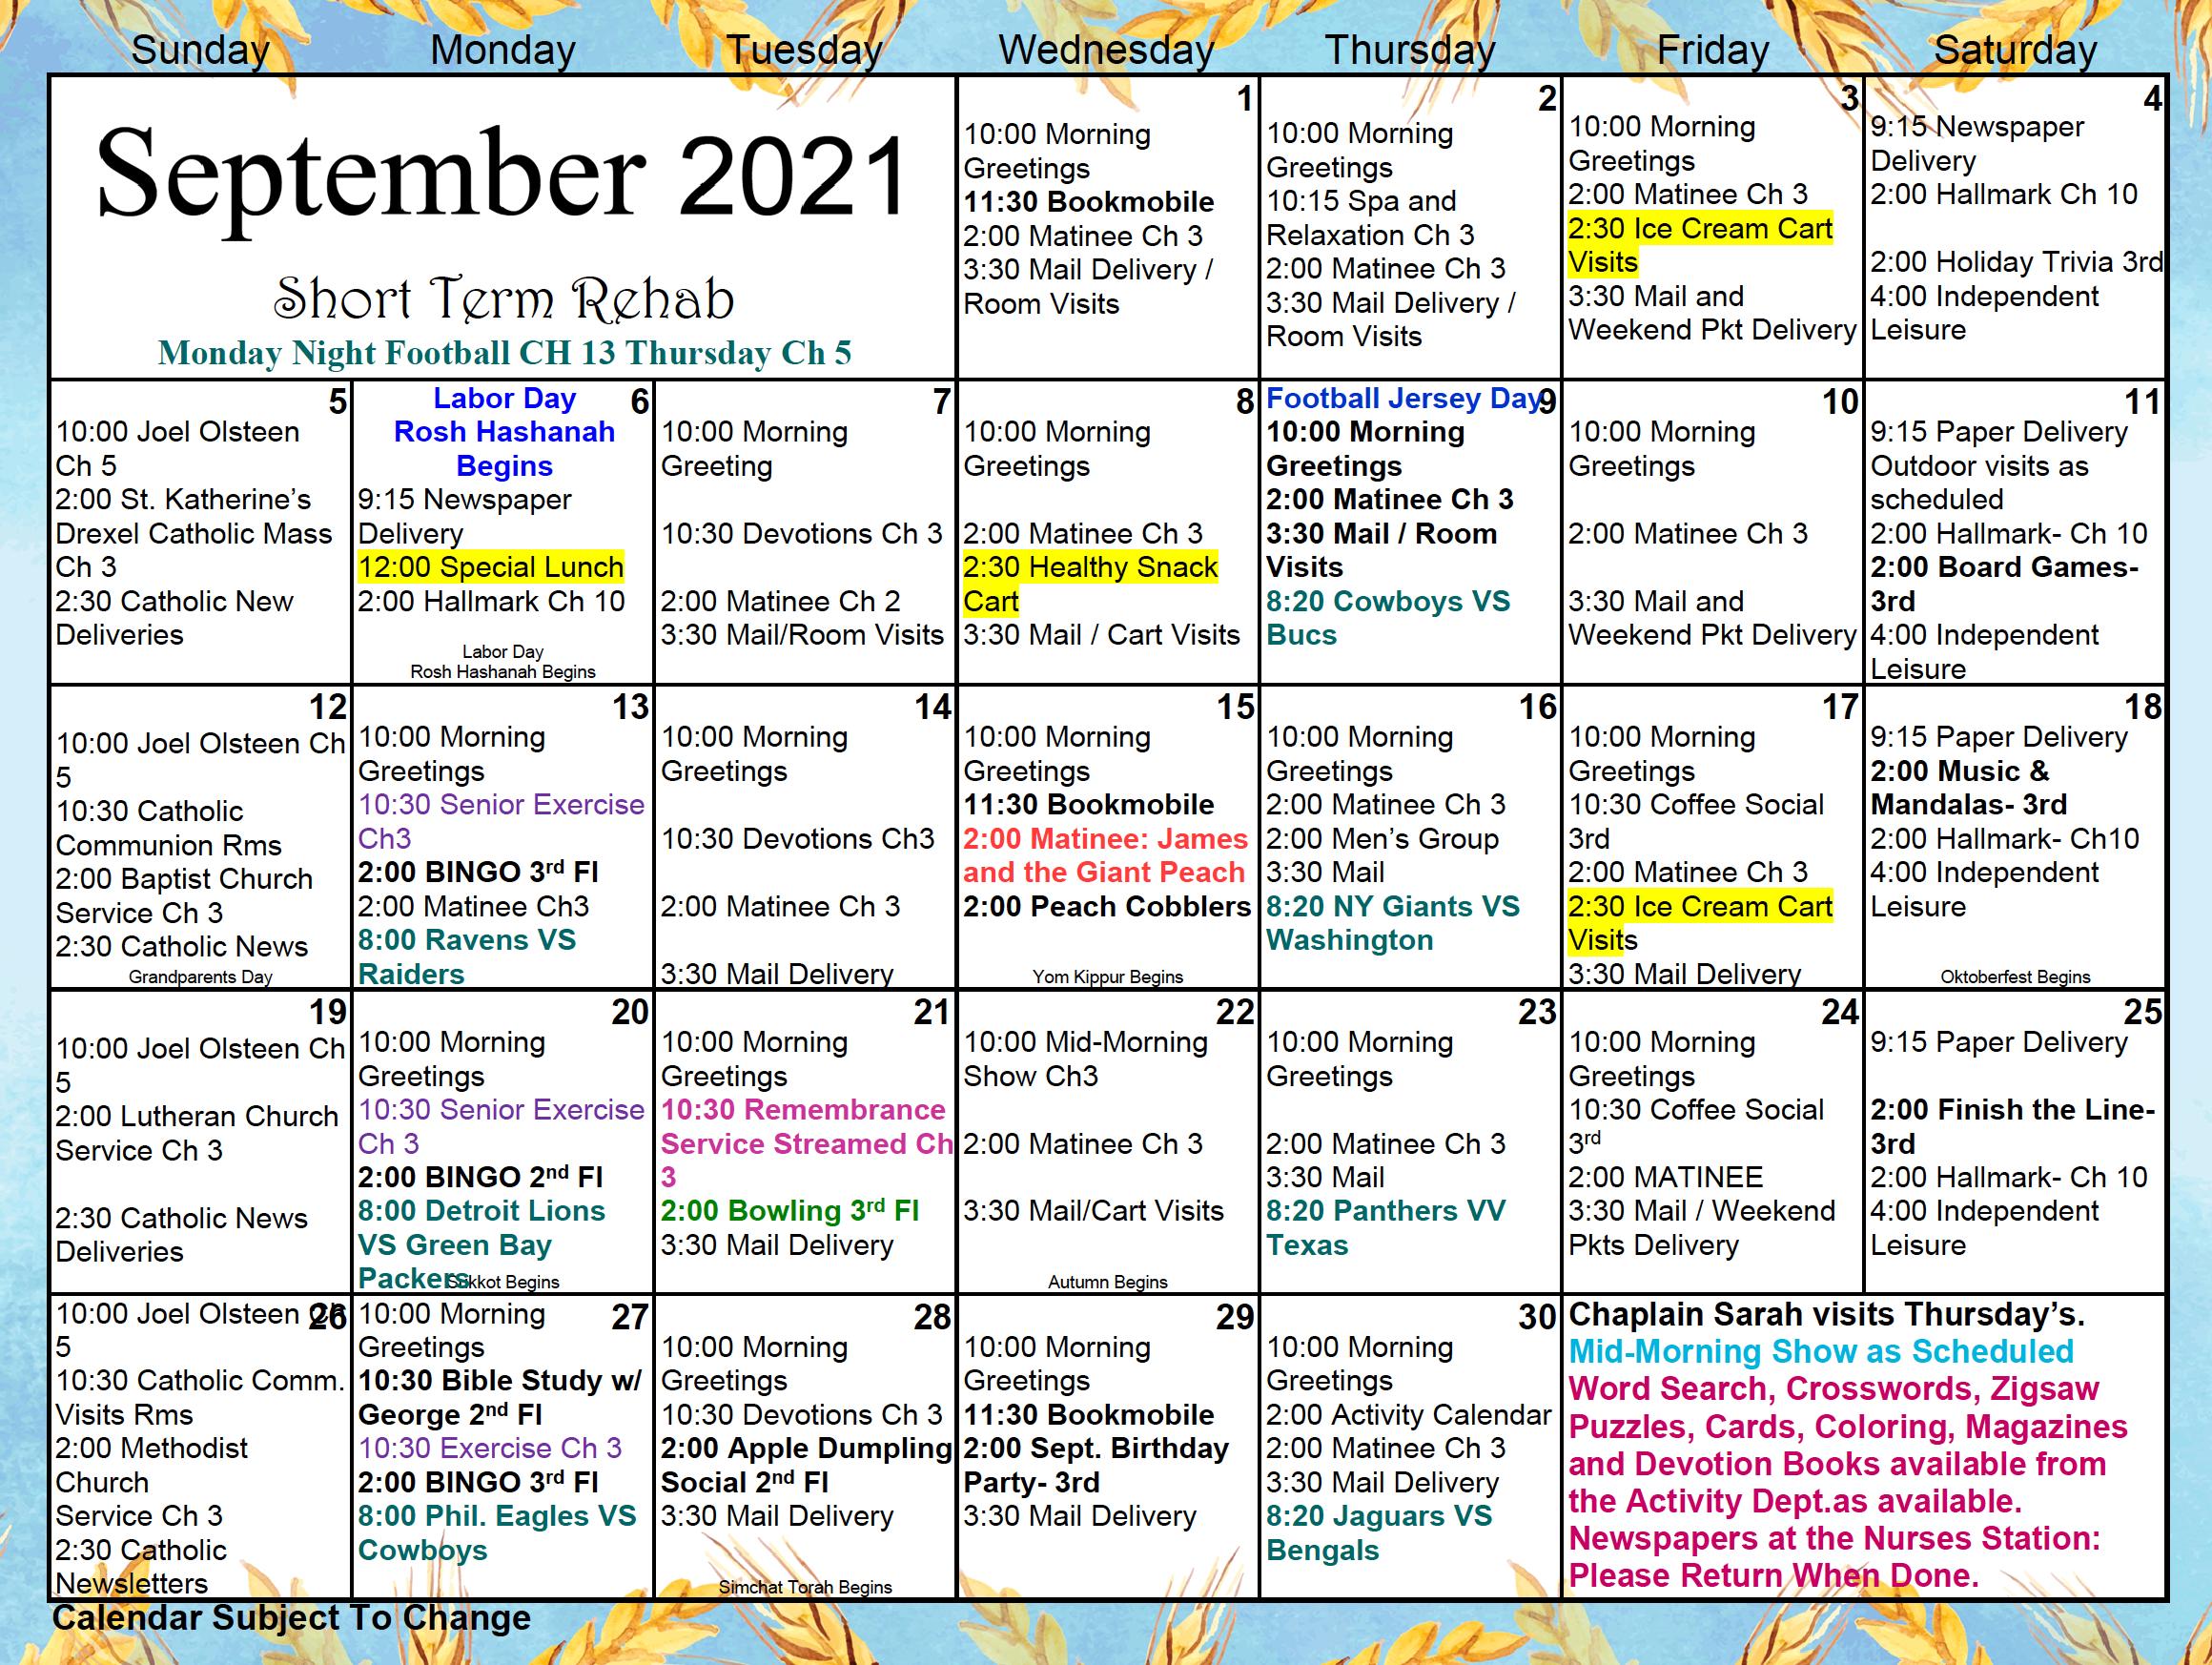 Short Term Rehab September Activity Calendar